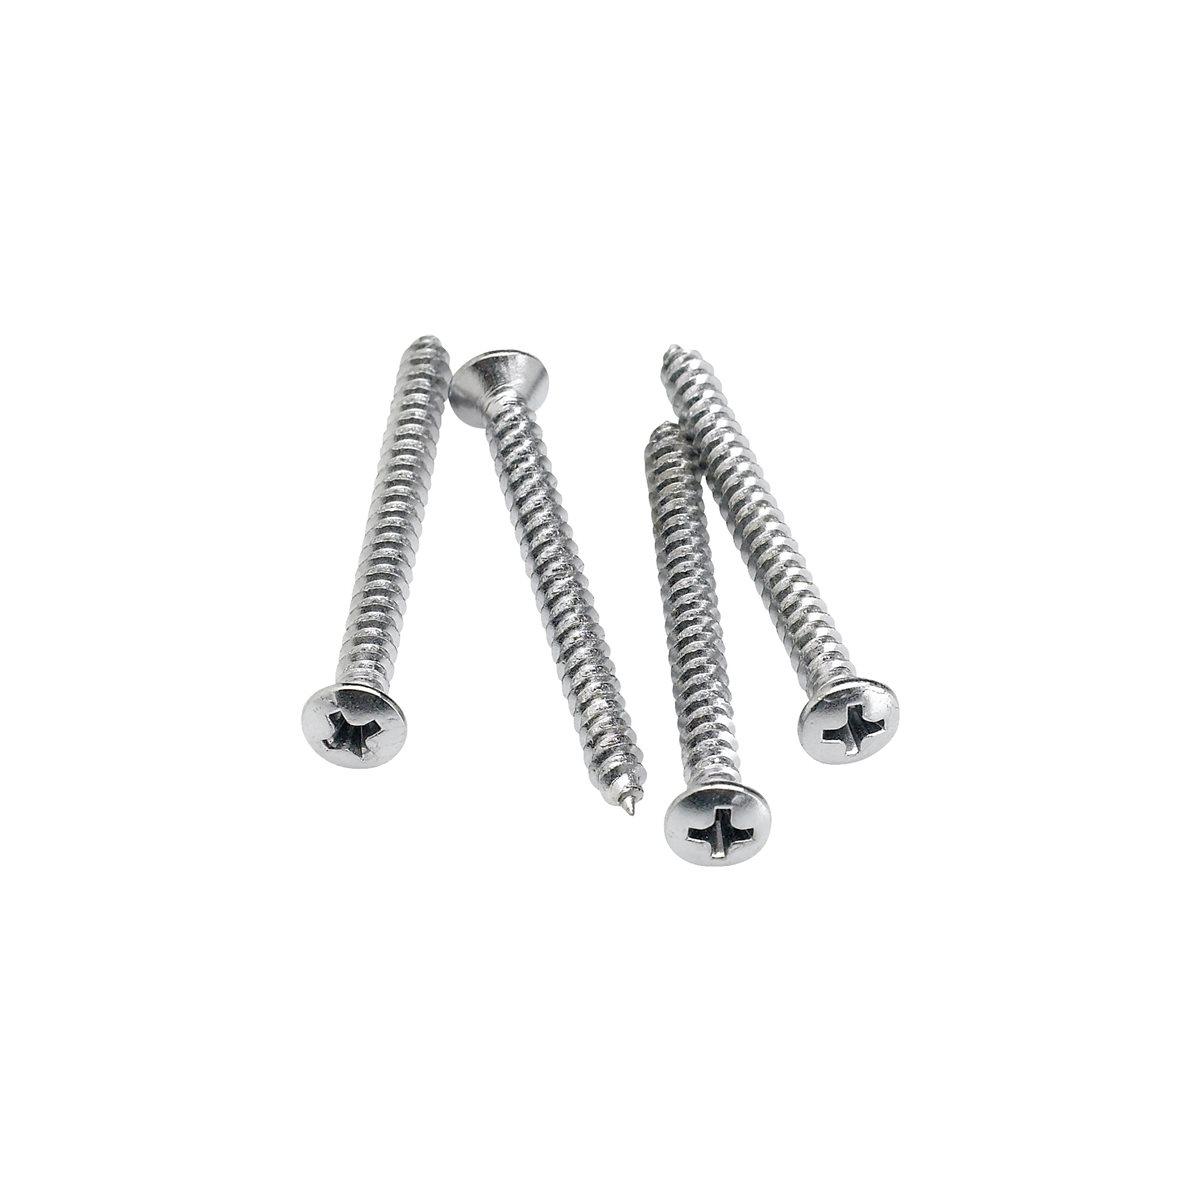 FENDER - NECK MOUNTING SCREWS (4)